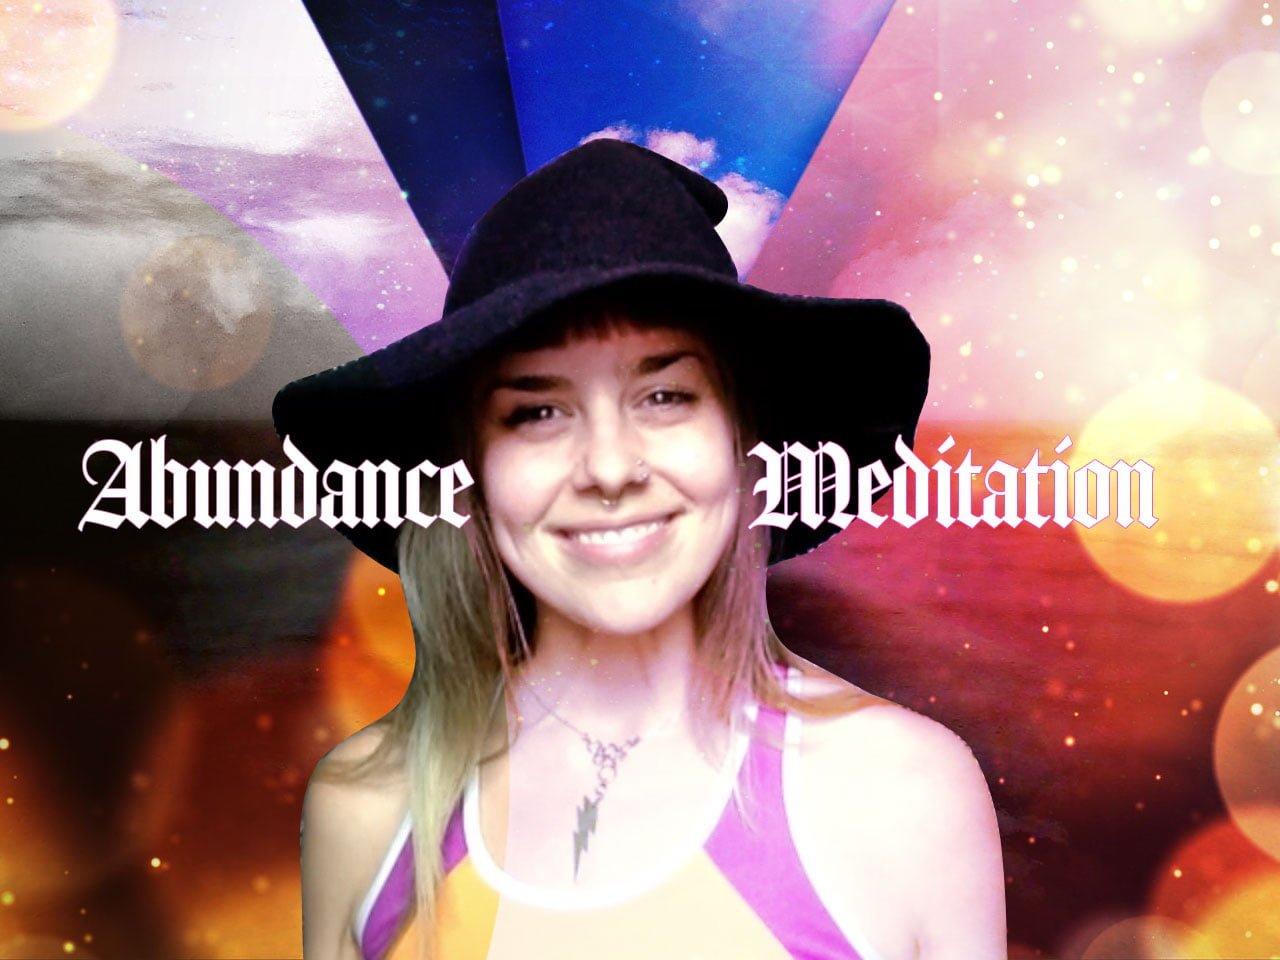 Meditation on Abundance by Jessica Mullen